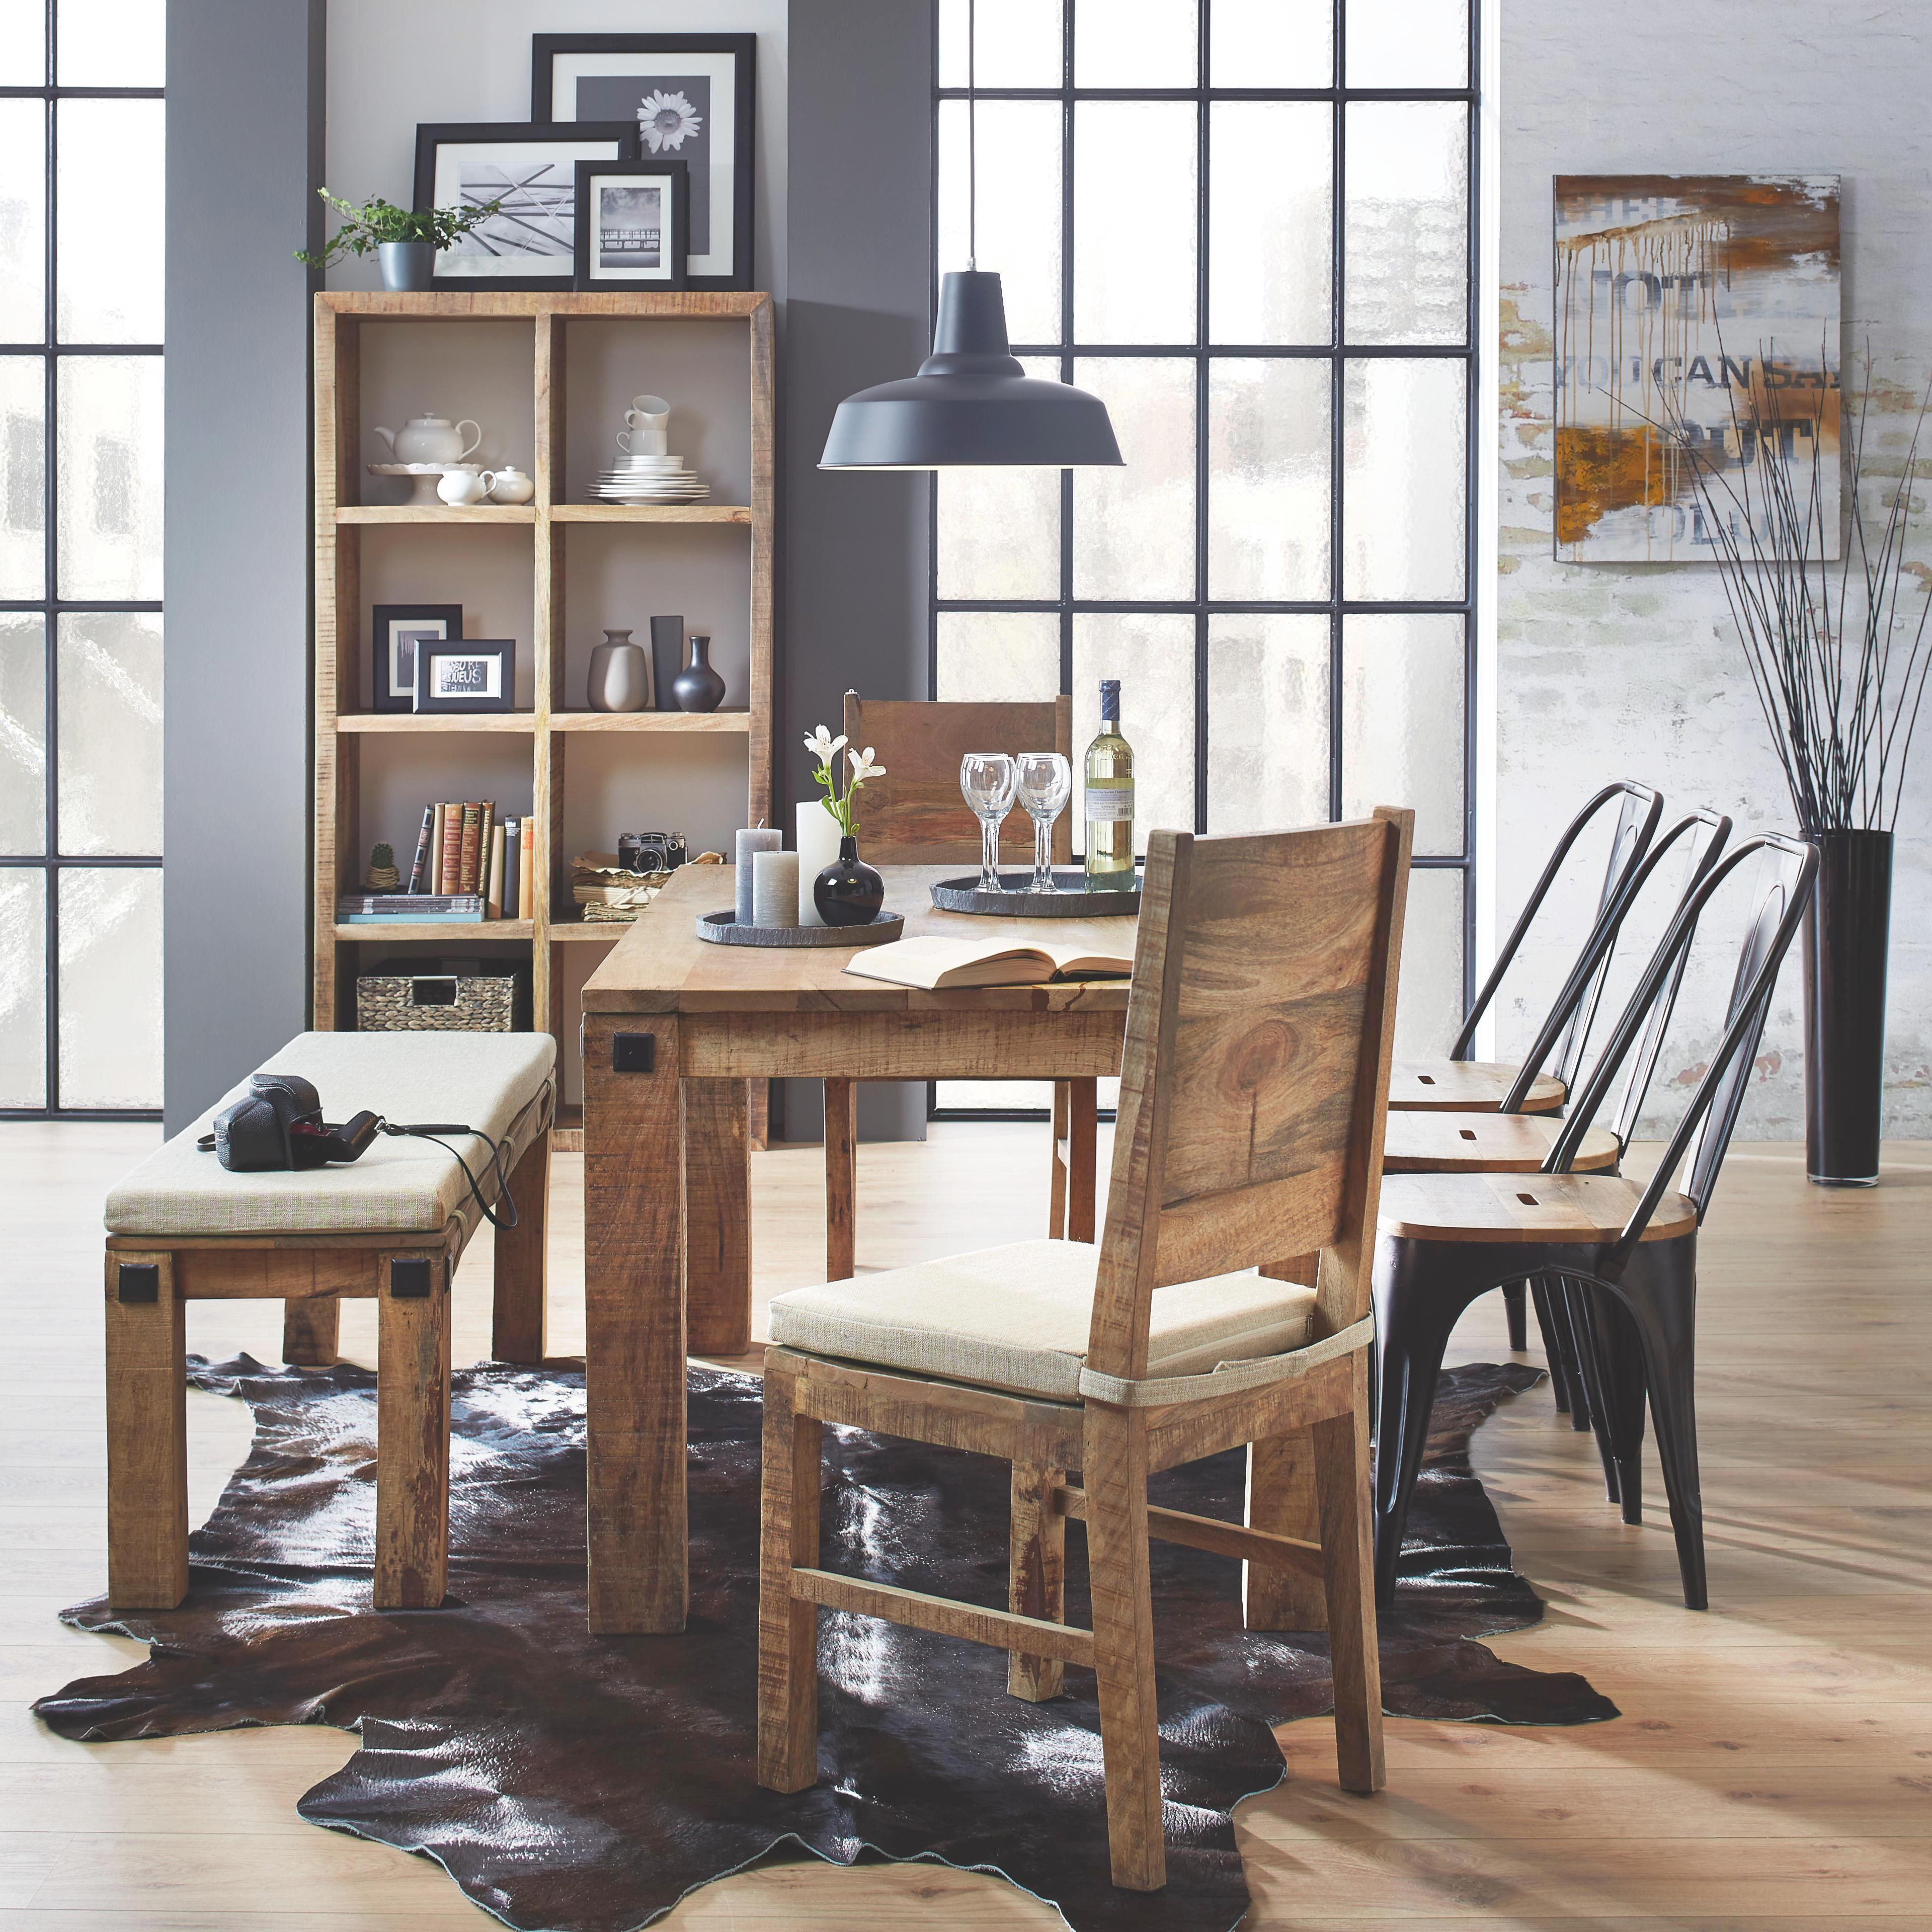 Sitzbank in Braun aus Mango massiv - Naturfarben, LIFESTYLE, Holz (140/40/45cm) - ZANDIARA